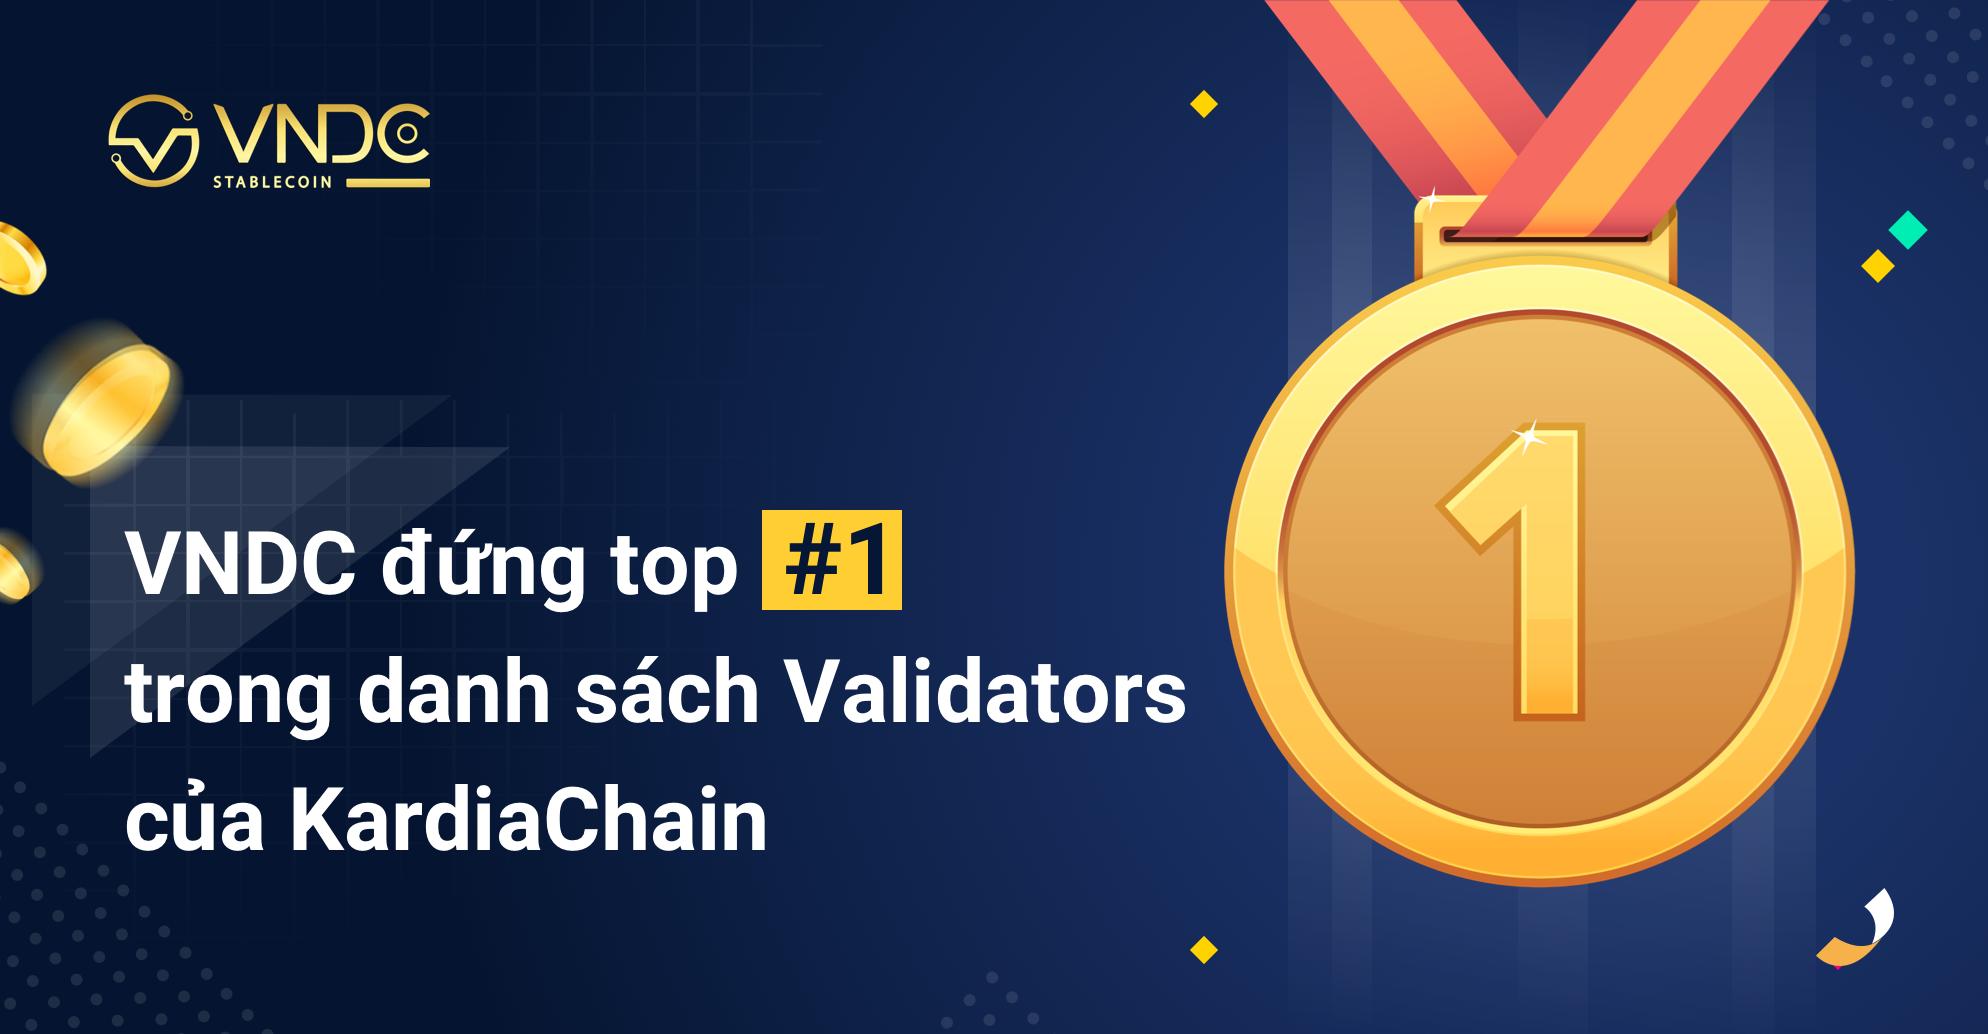 Tặng 100 triệu VNDC cho các Delegators stake KAI tại VNDC Wallet Pro Validator